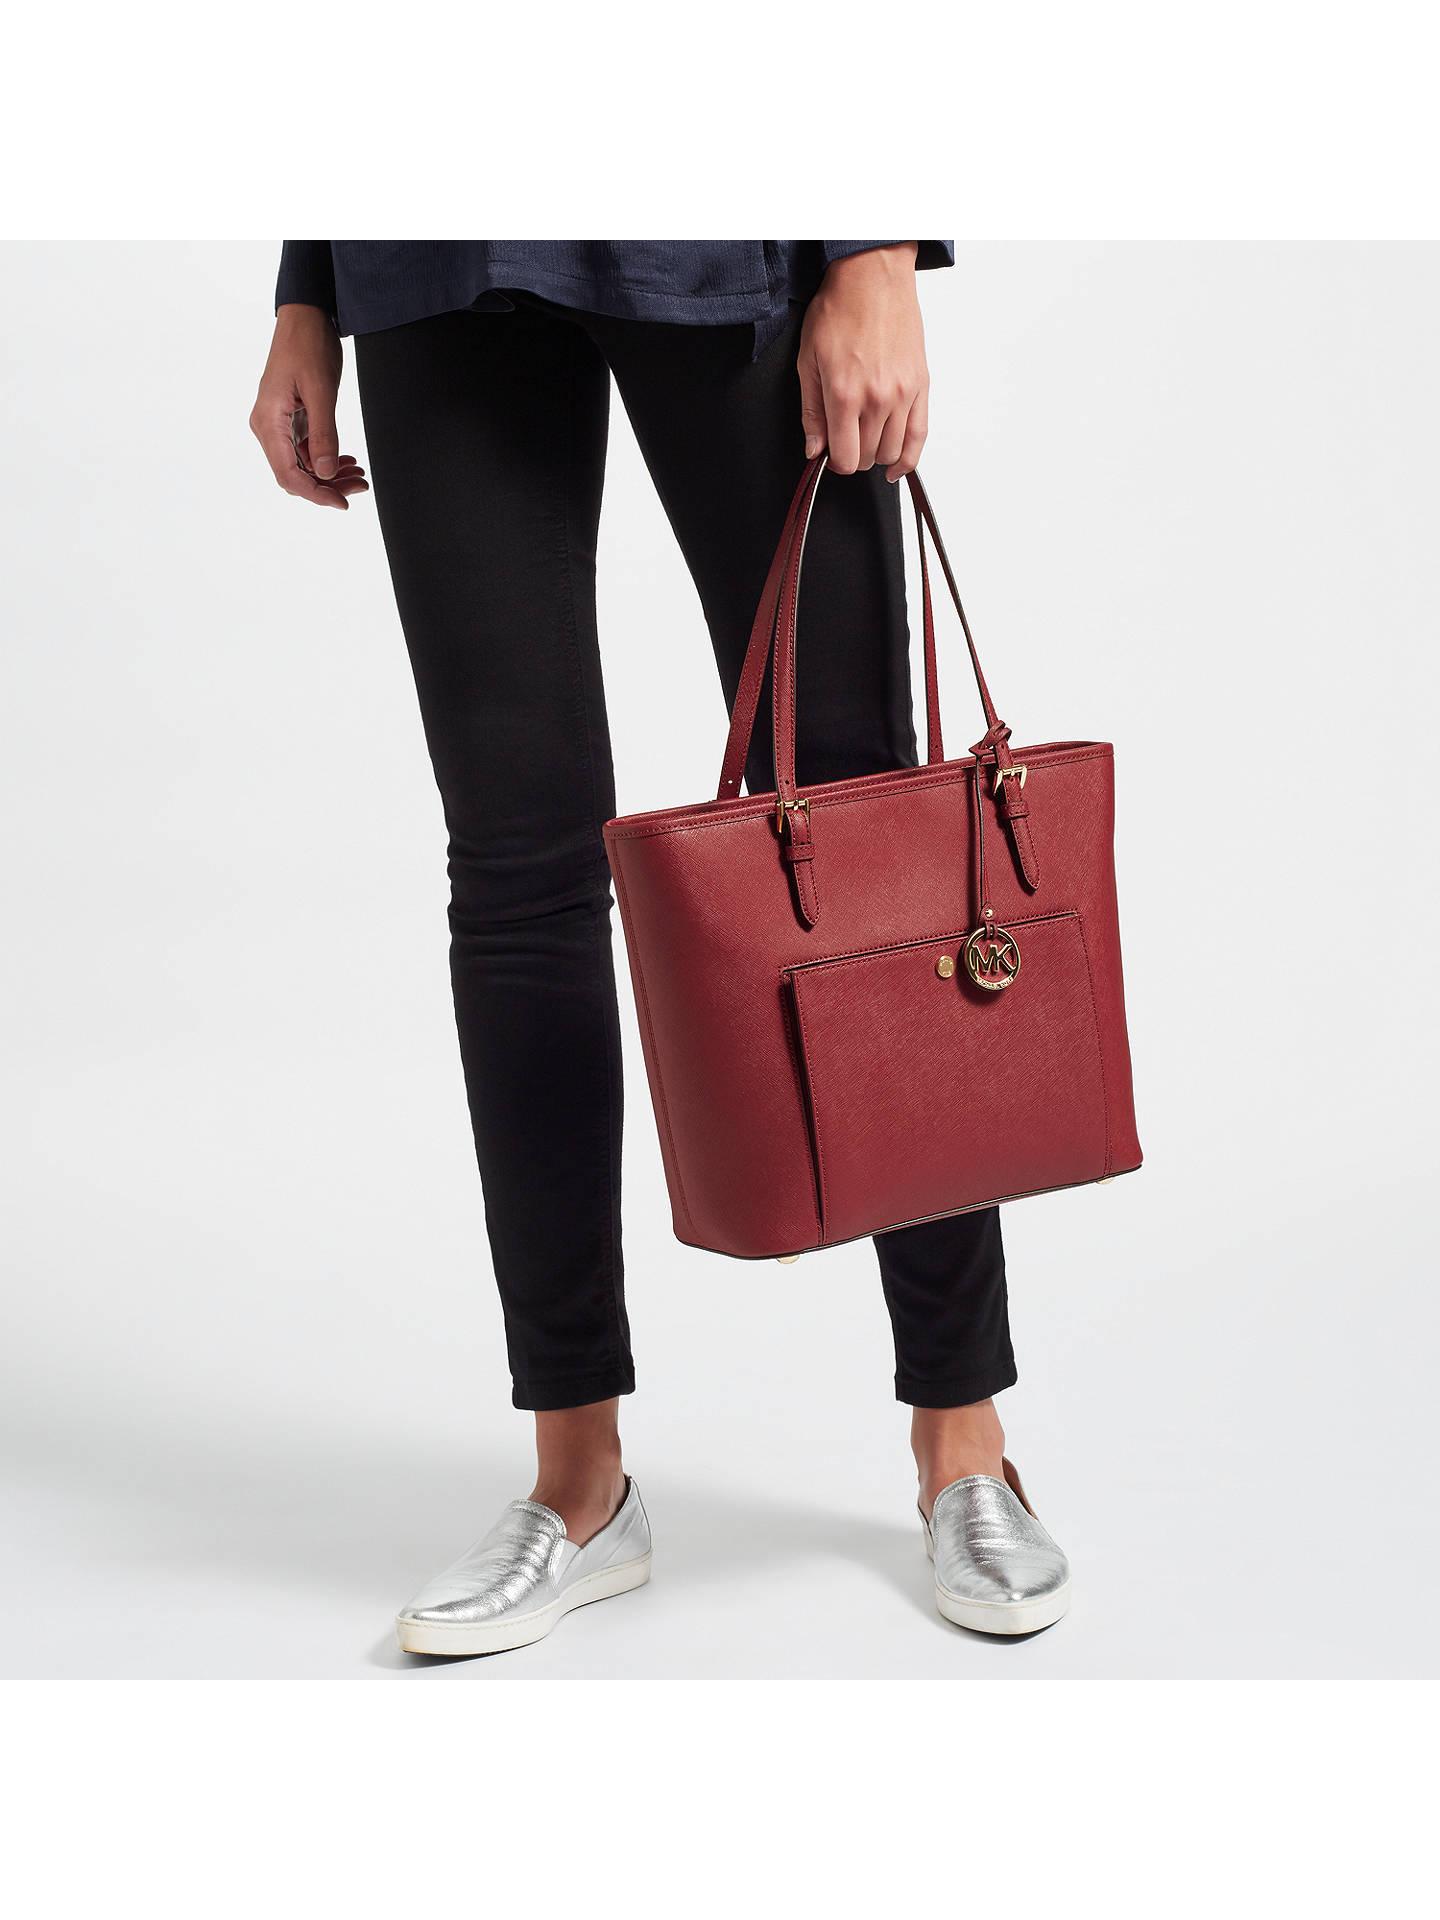 72c58e12ee2d ... Buy MICHAEL Michael Kors Jet Set Snap Pocket Leather Tote Bag